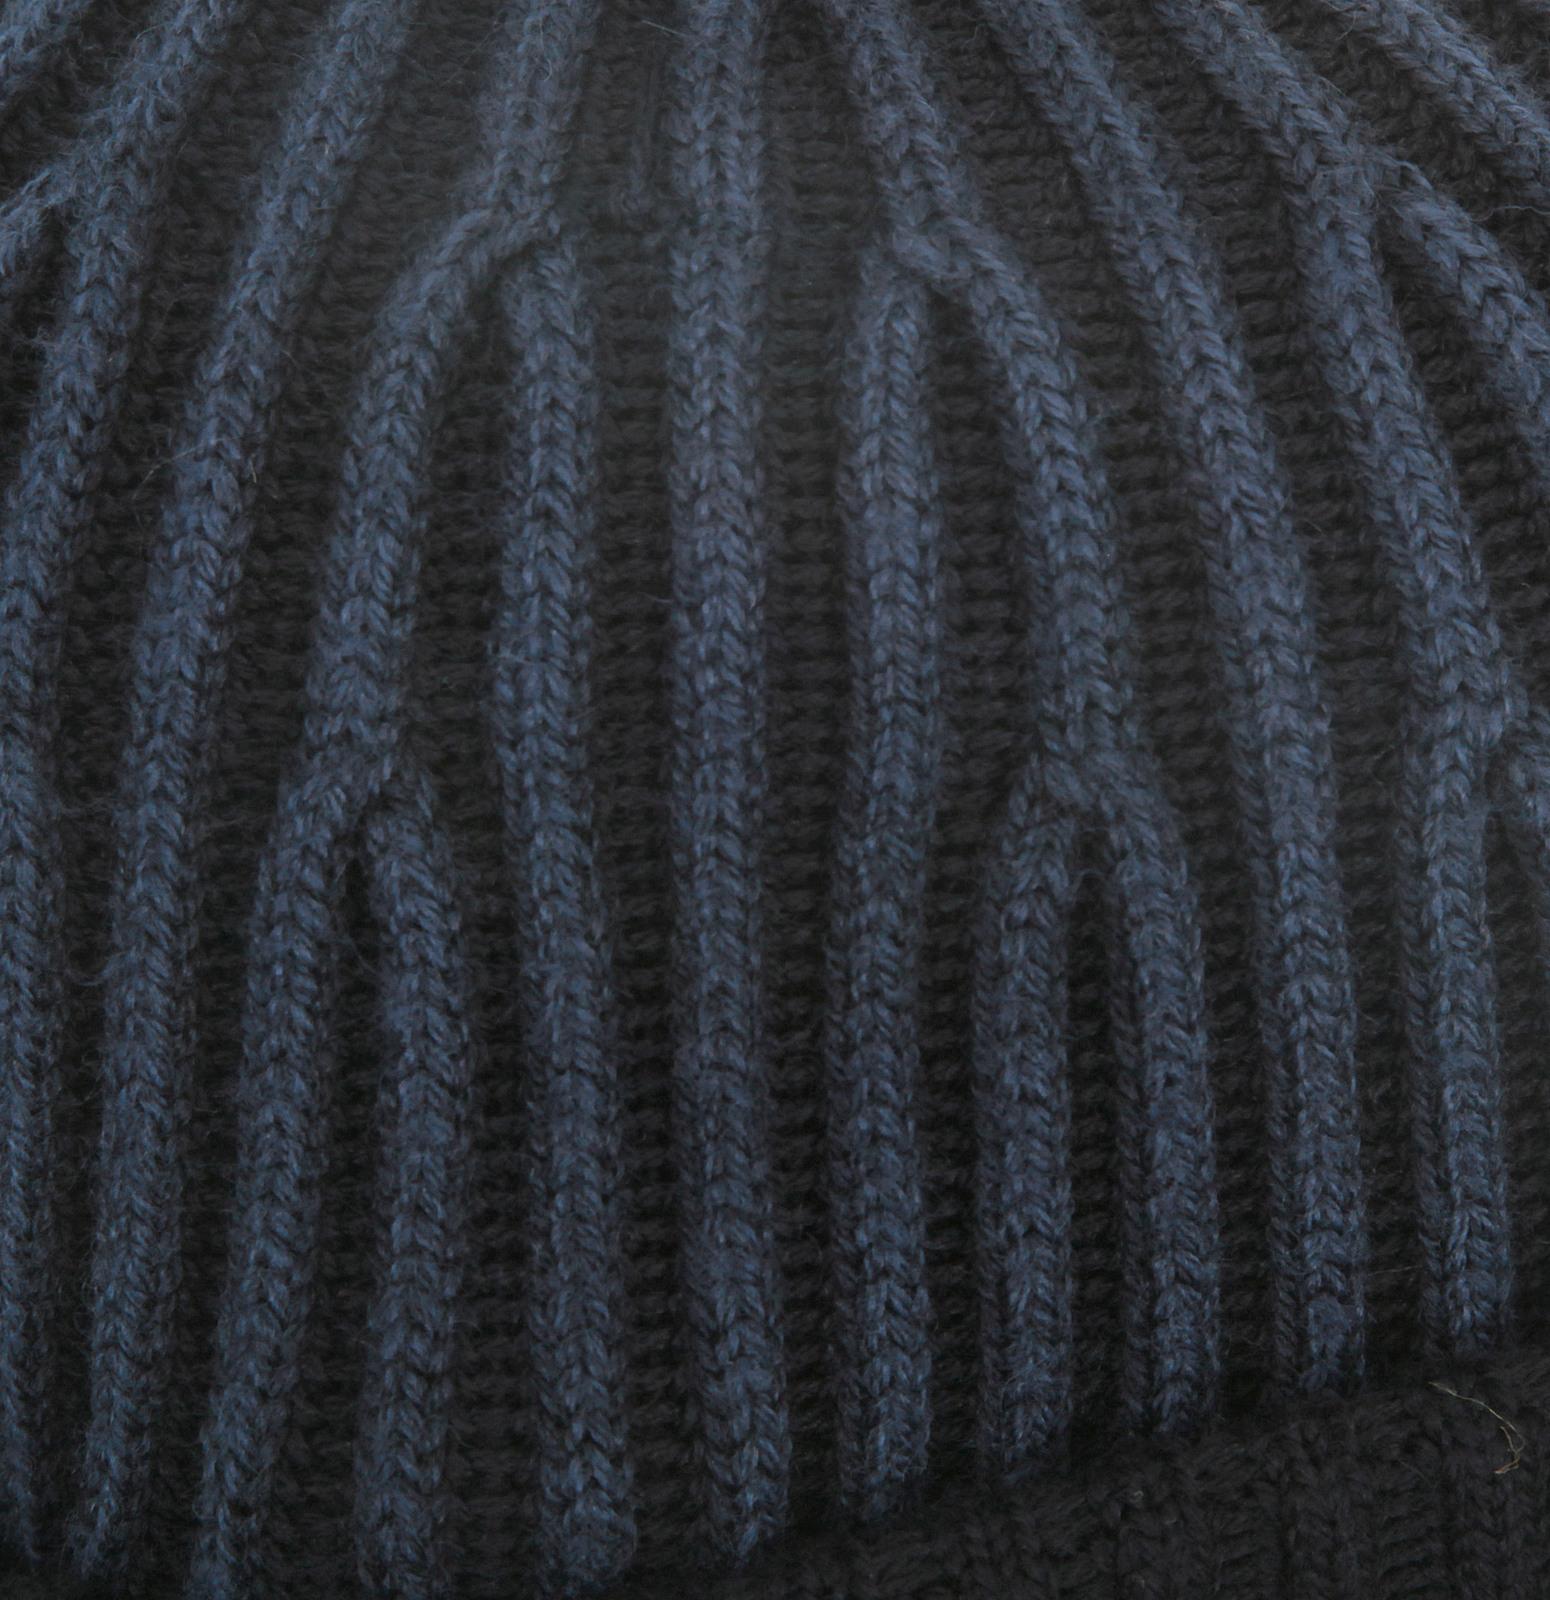 12fd51989ea Stone Island mens navy rib knit 6115N09C6 beanie hat SI3016 at ...